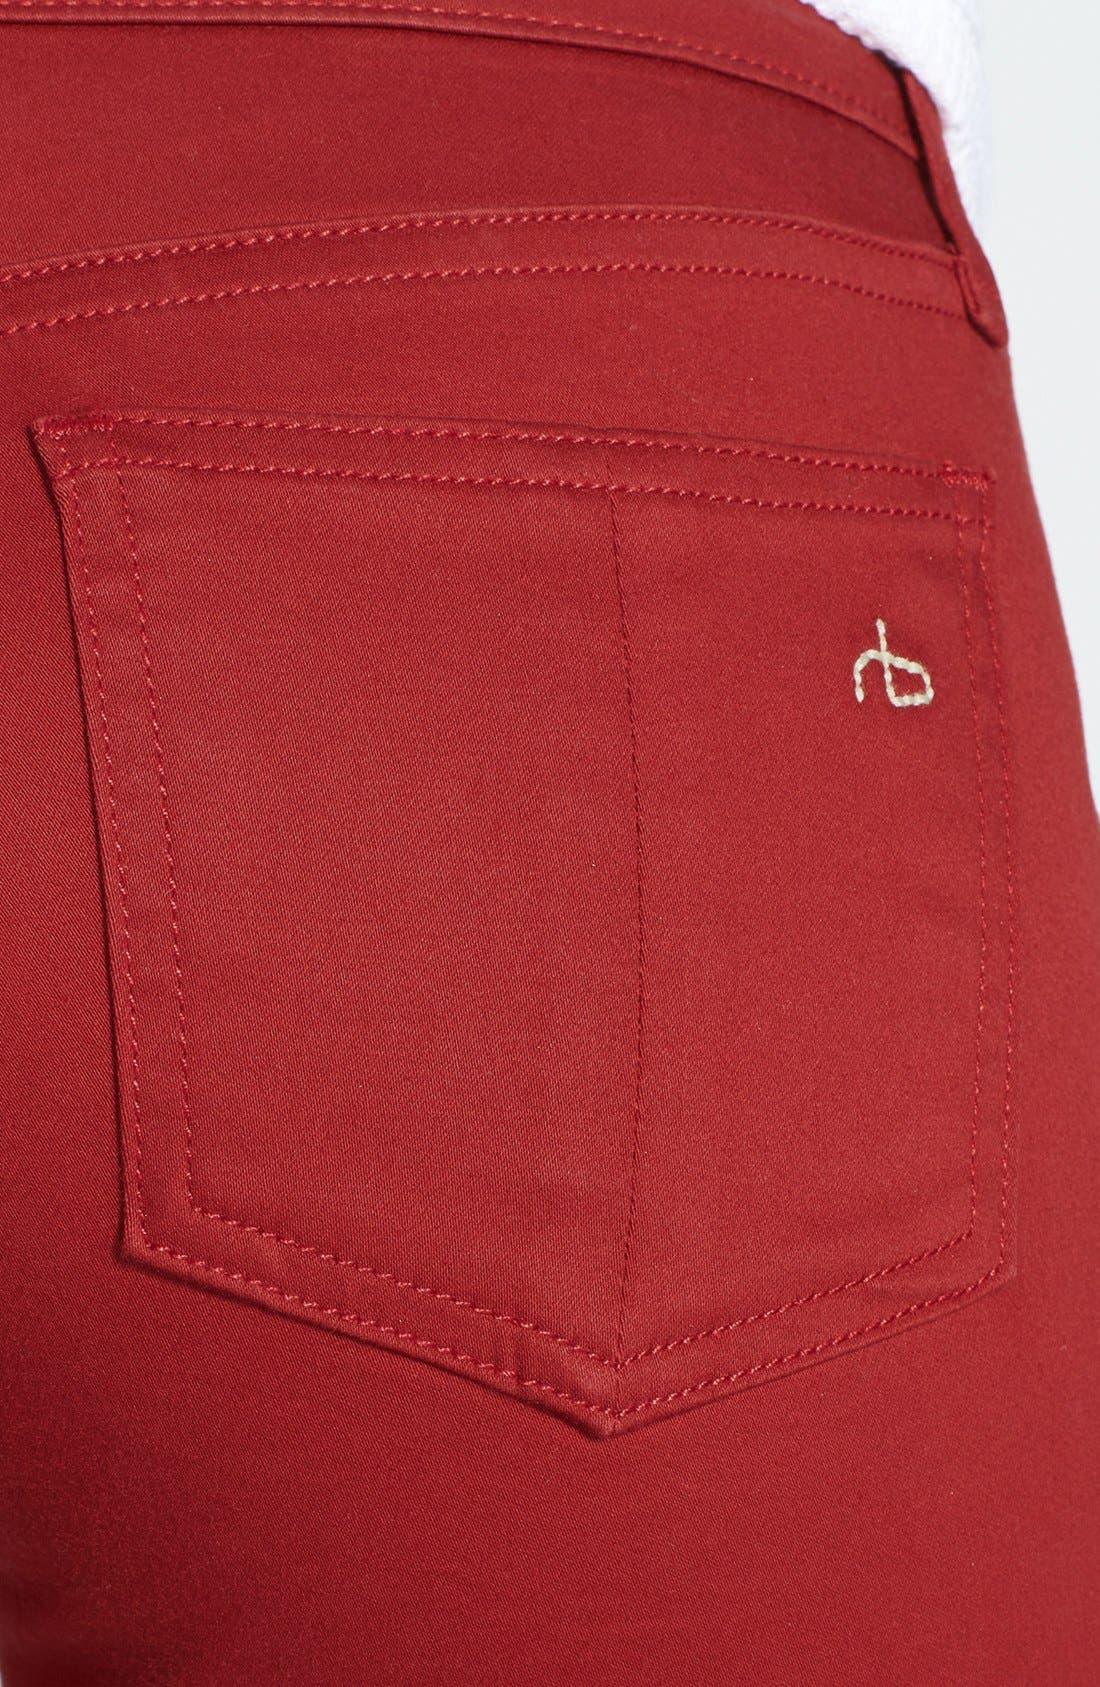 Alternate Image 3  - rag & bone/JEAN 'The Legging' Sateen Skinny Jeans (Red Sateen)